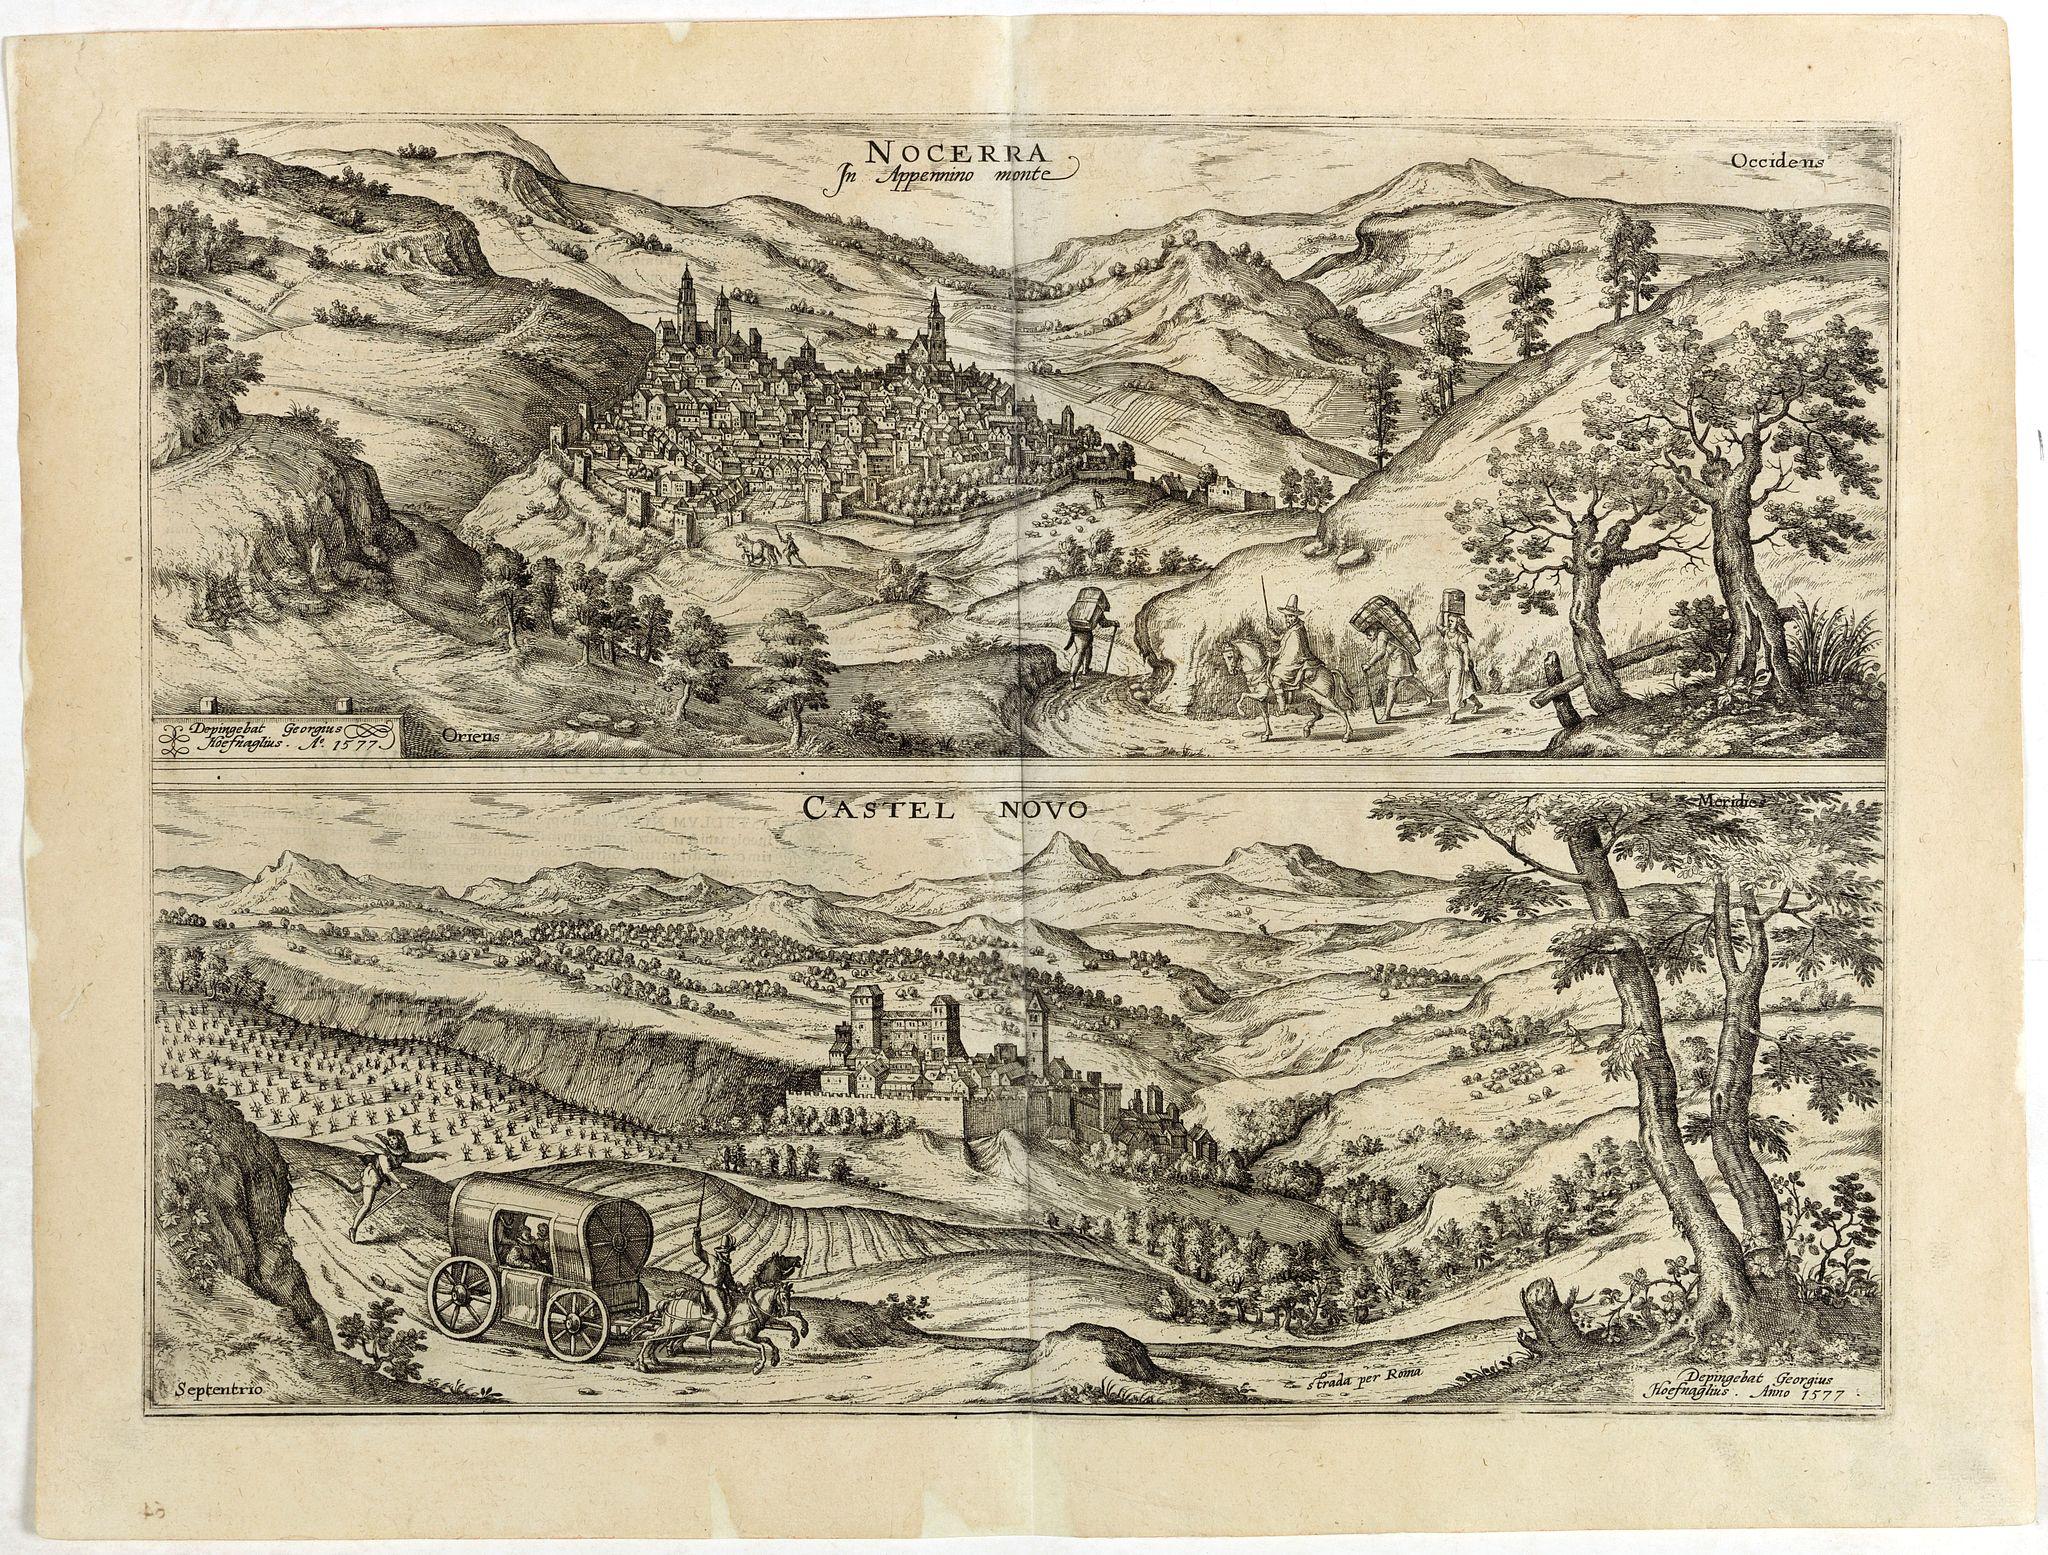 BRAUN, G. / HOGENBERG, F. -  Nocerra In Appennino monte [together on one sheet with]  Castel Novo.